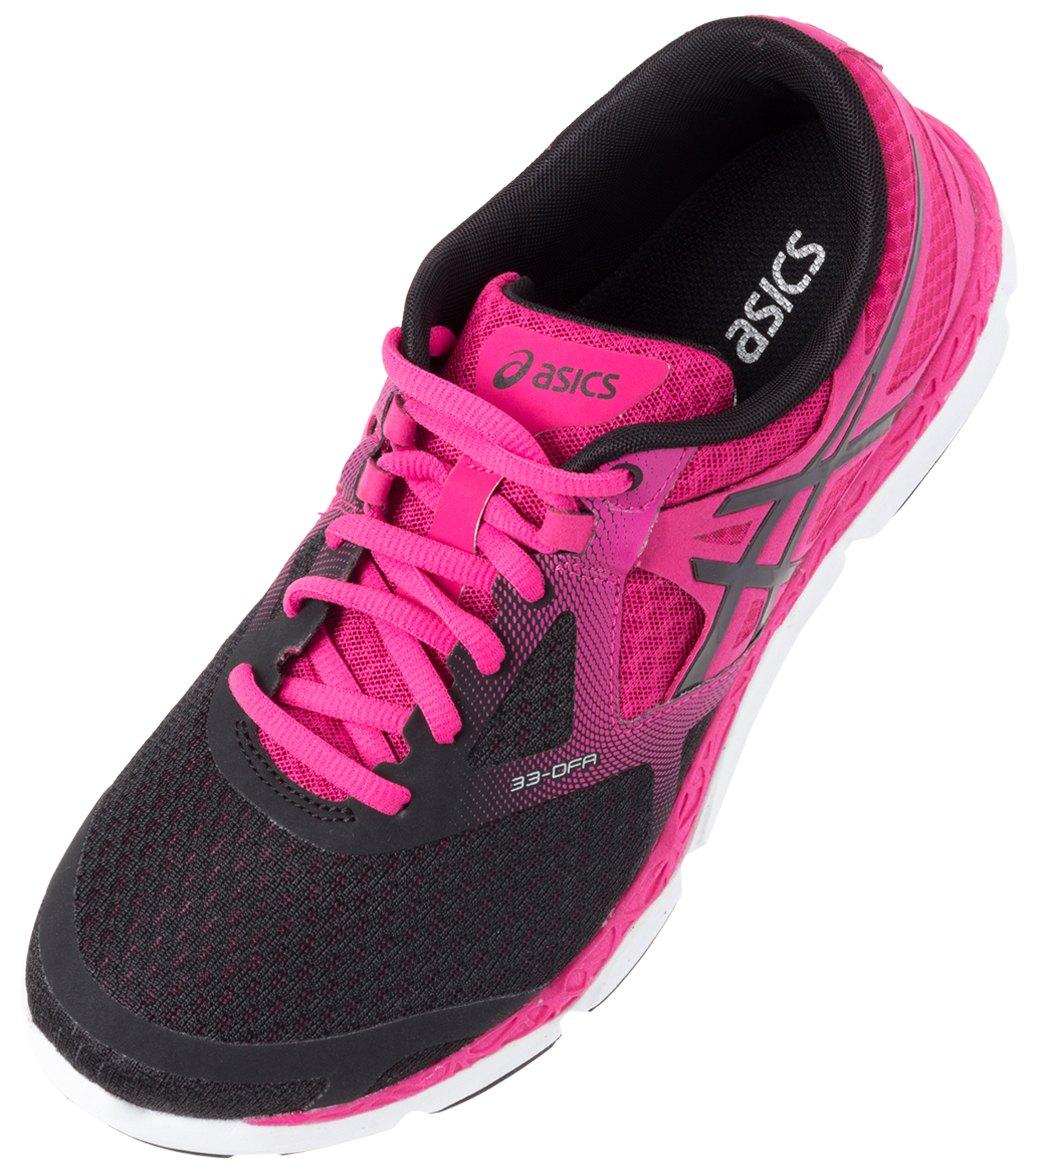 a9b557454192 Asics Women s 33-DFA Running Shoes at SwimOutlet.com - Free Shipping